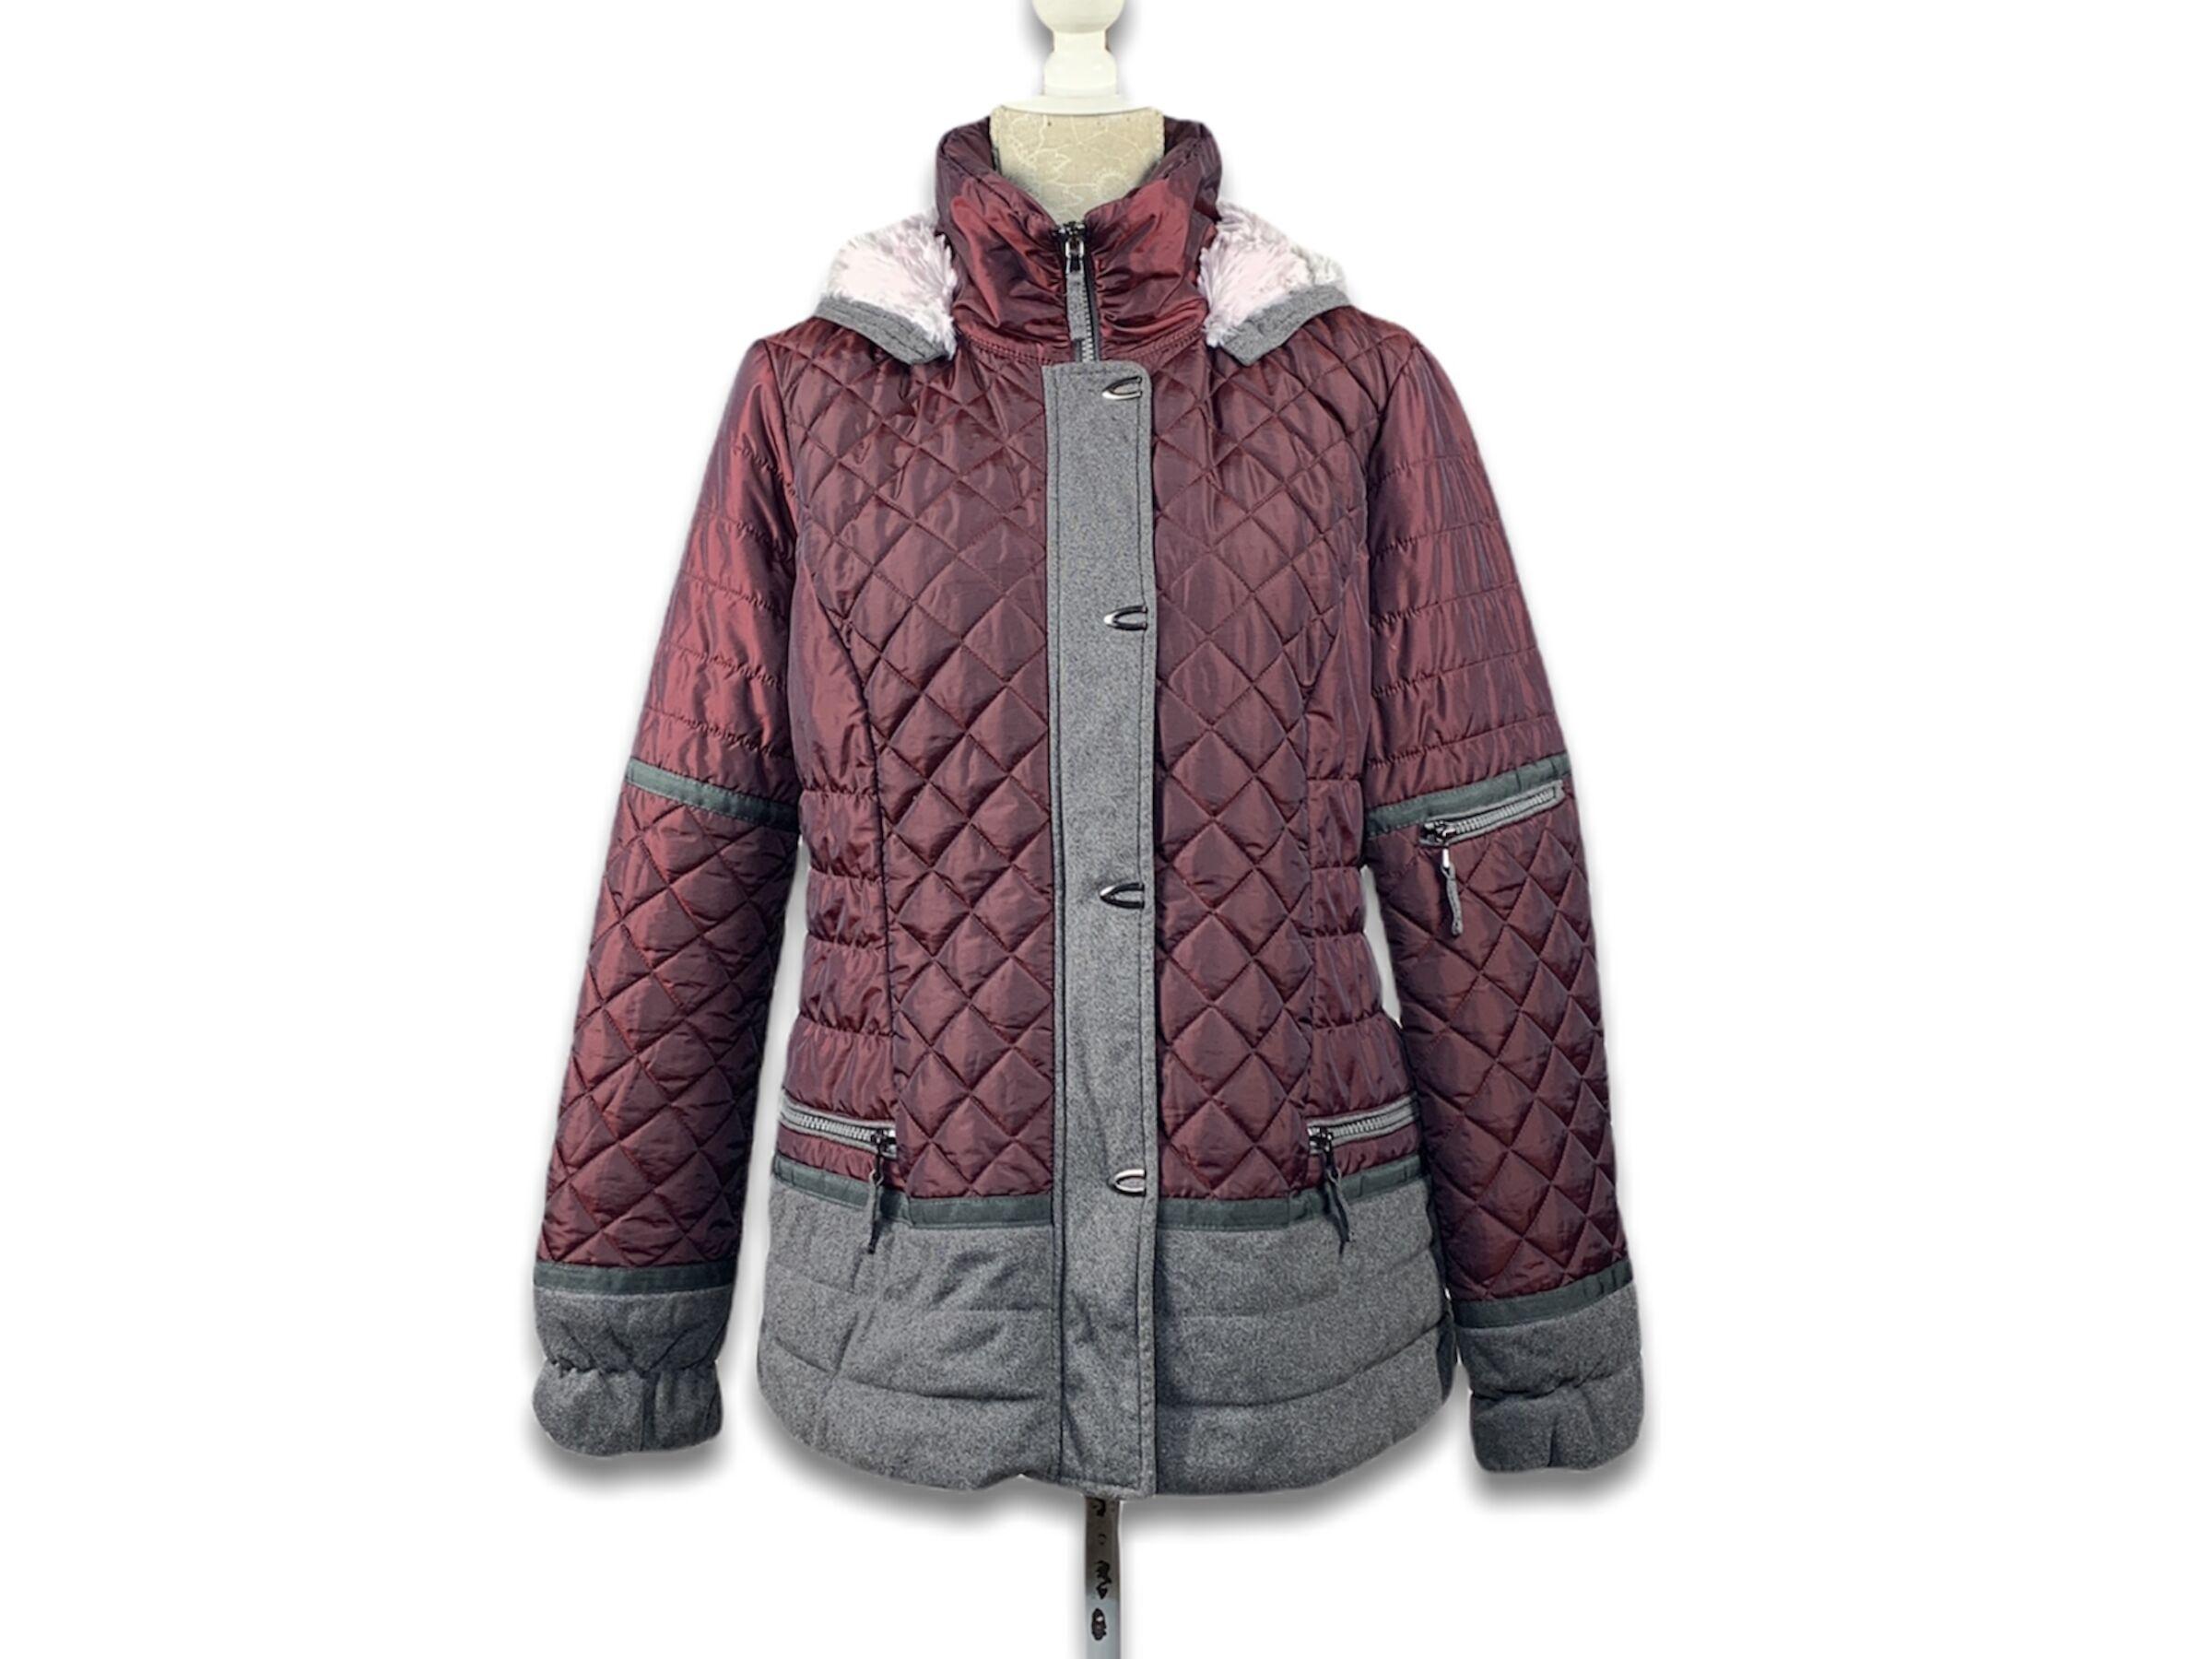 Crisca kabát (XL)